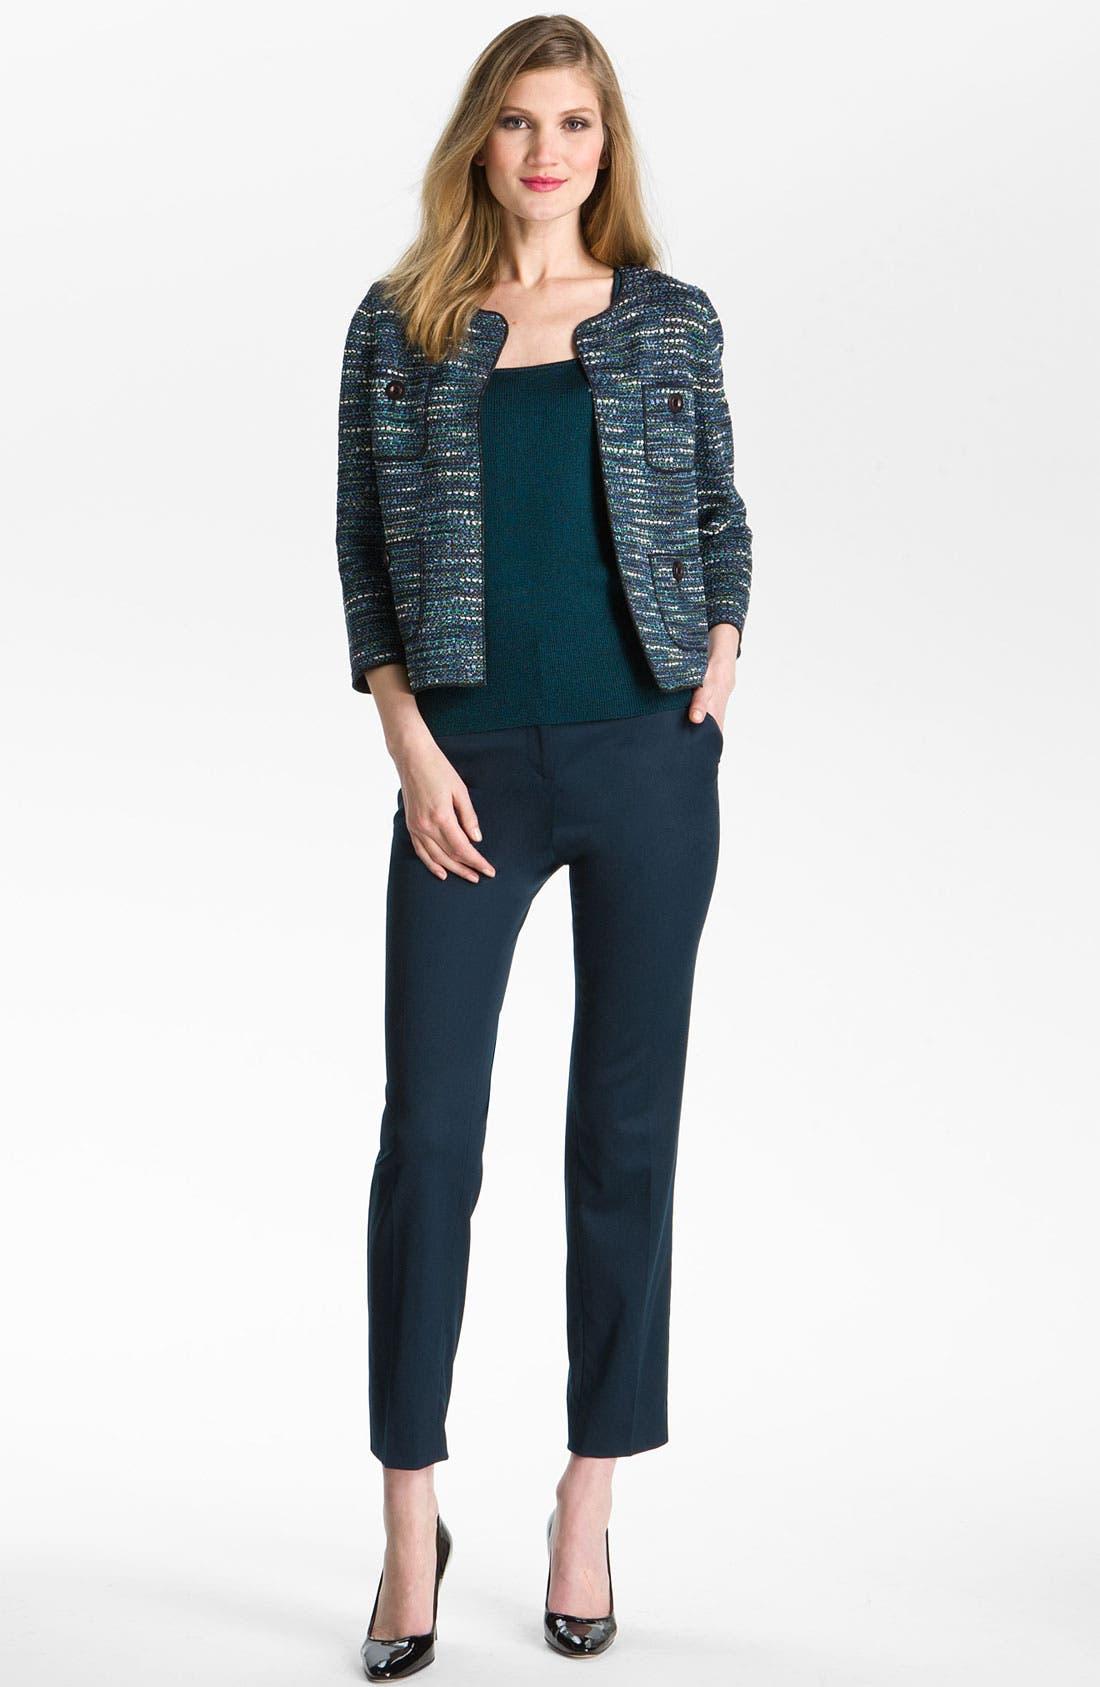 Main Image - St John Collection Tweed Jacket, Shell & Pants